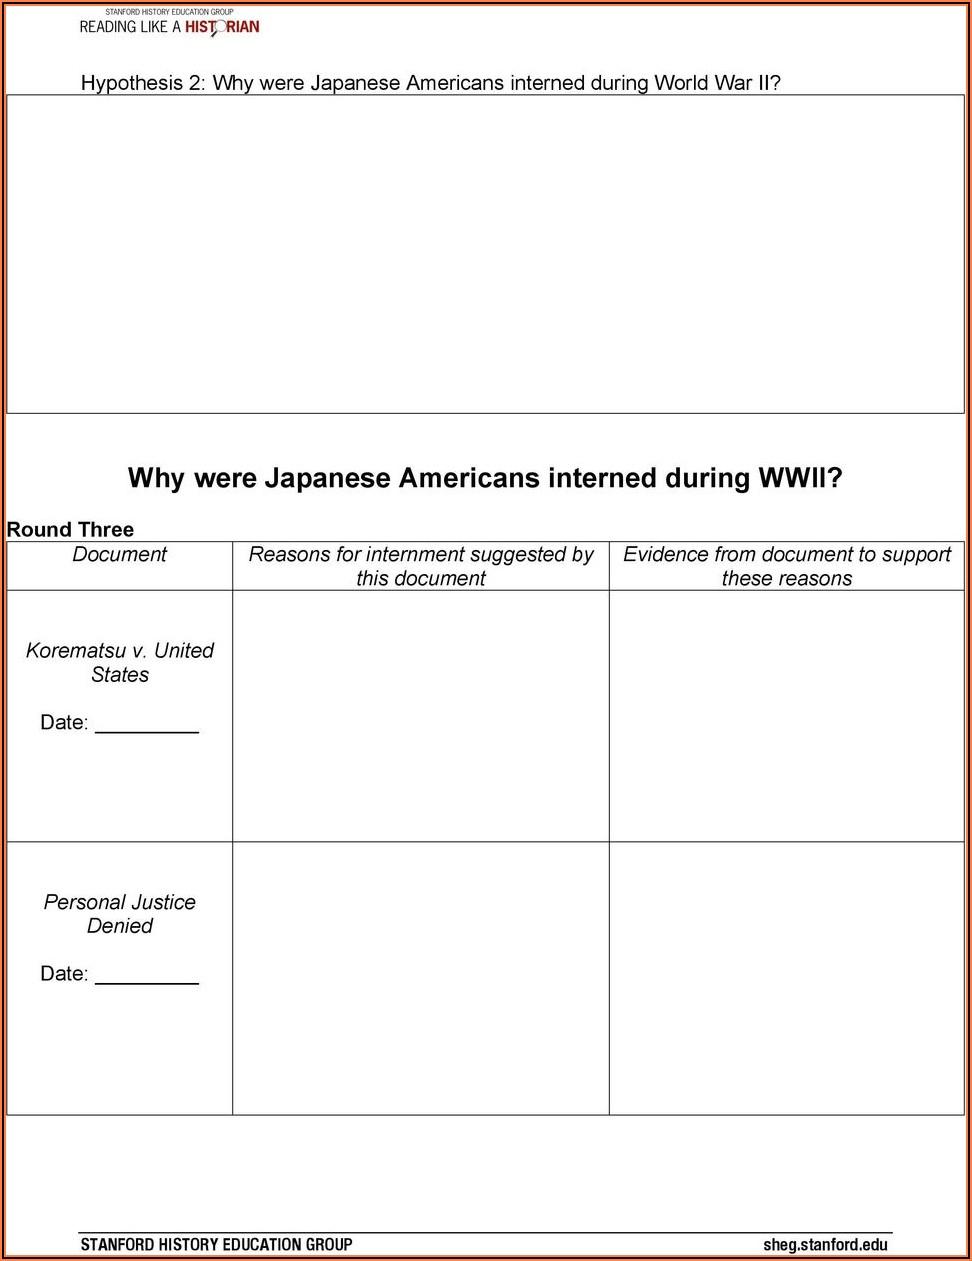 Japanese Internment Timeline Worksheet Answers